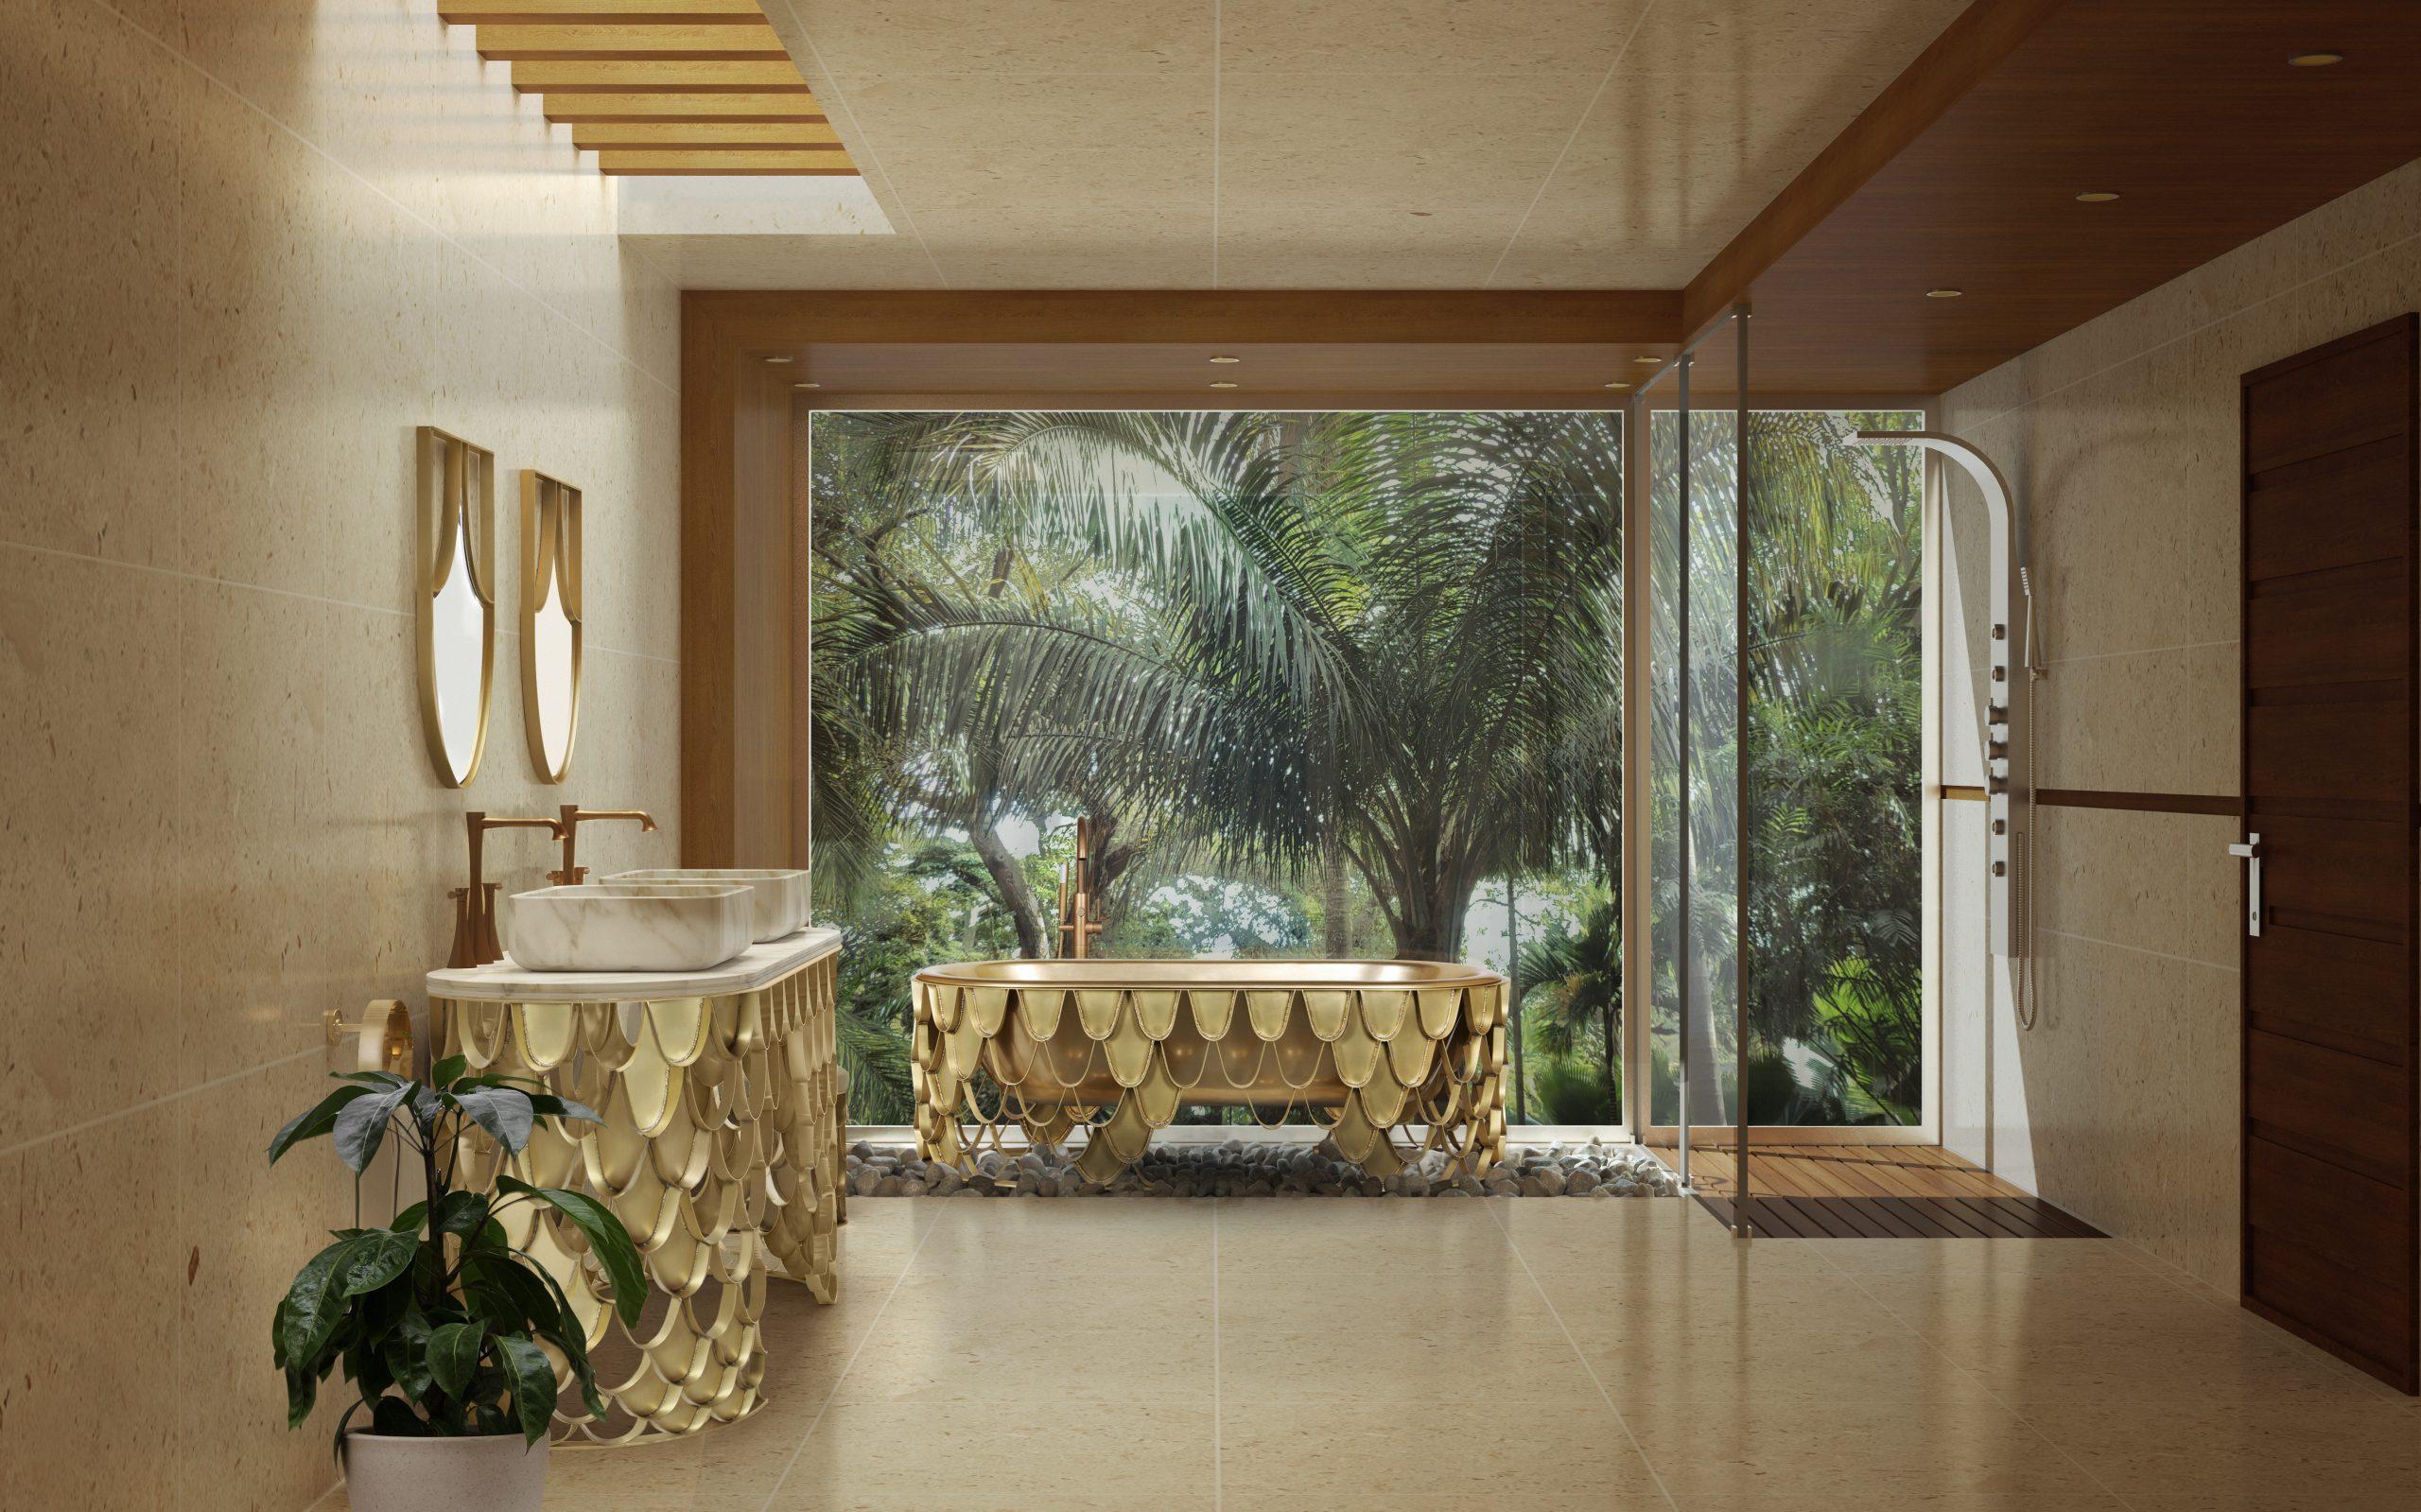 Earthy interior bathroom